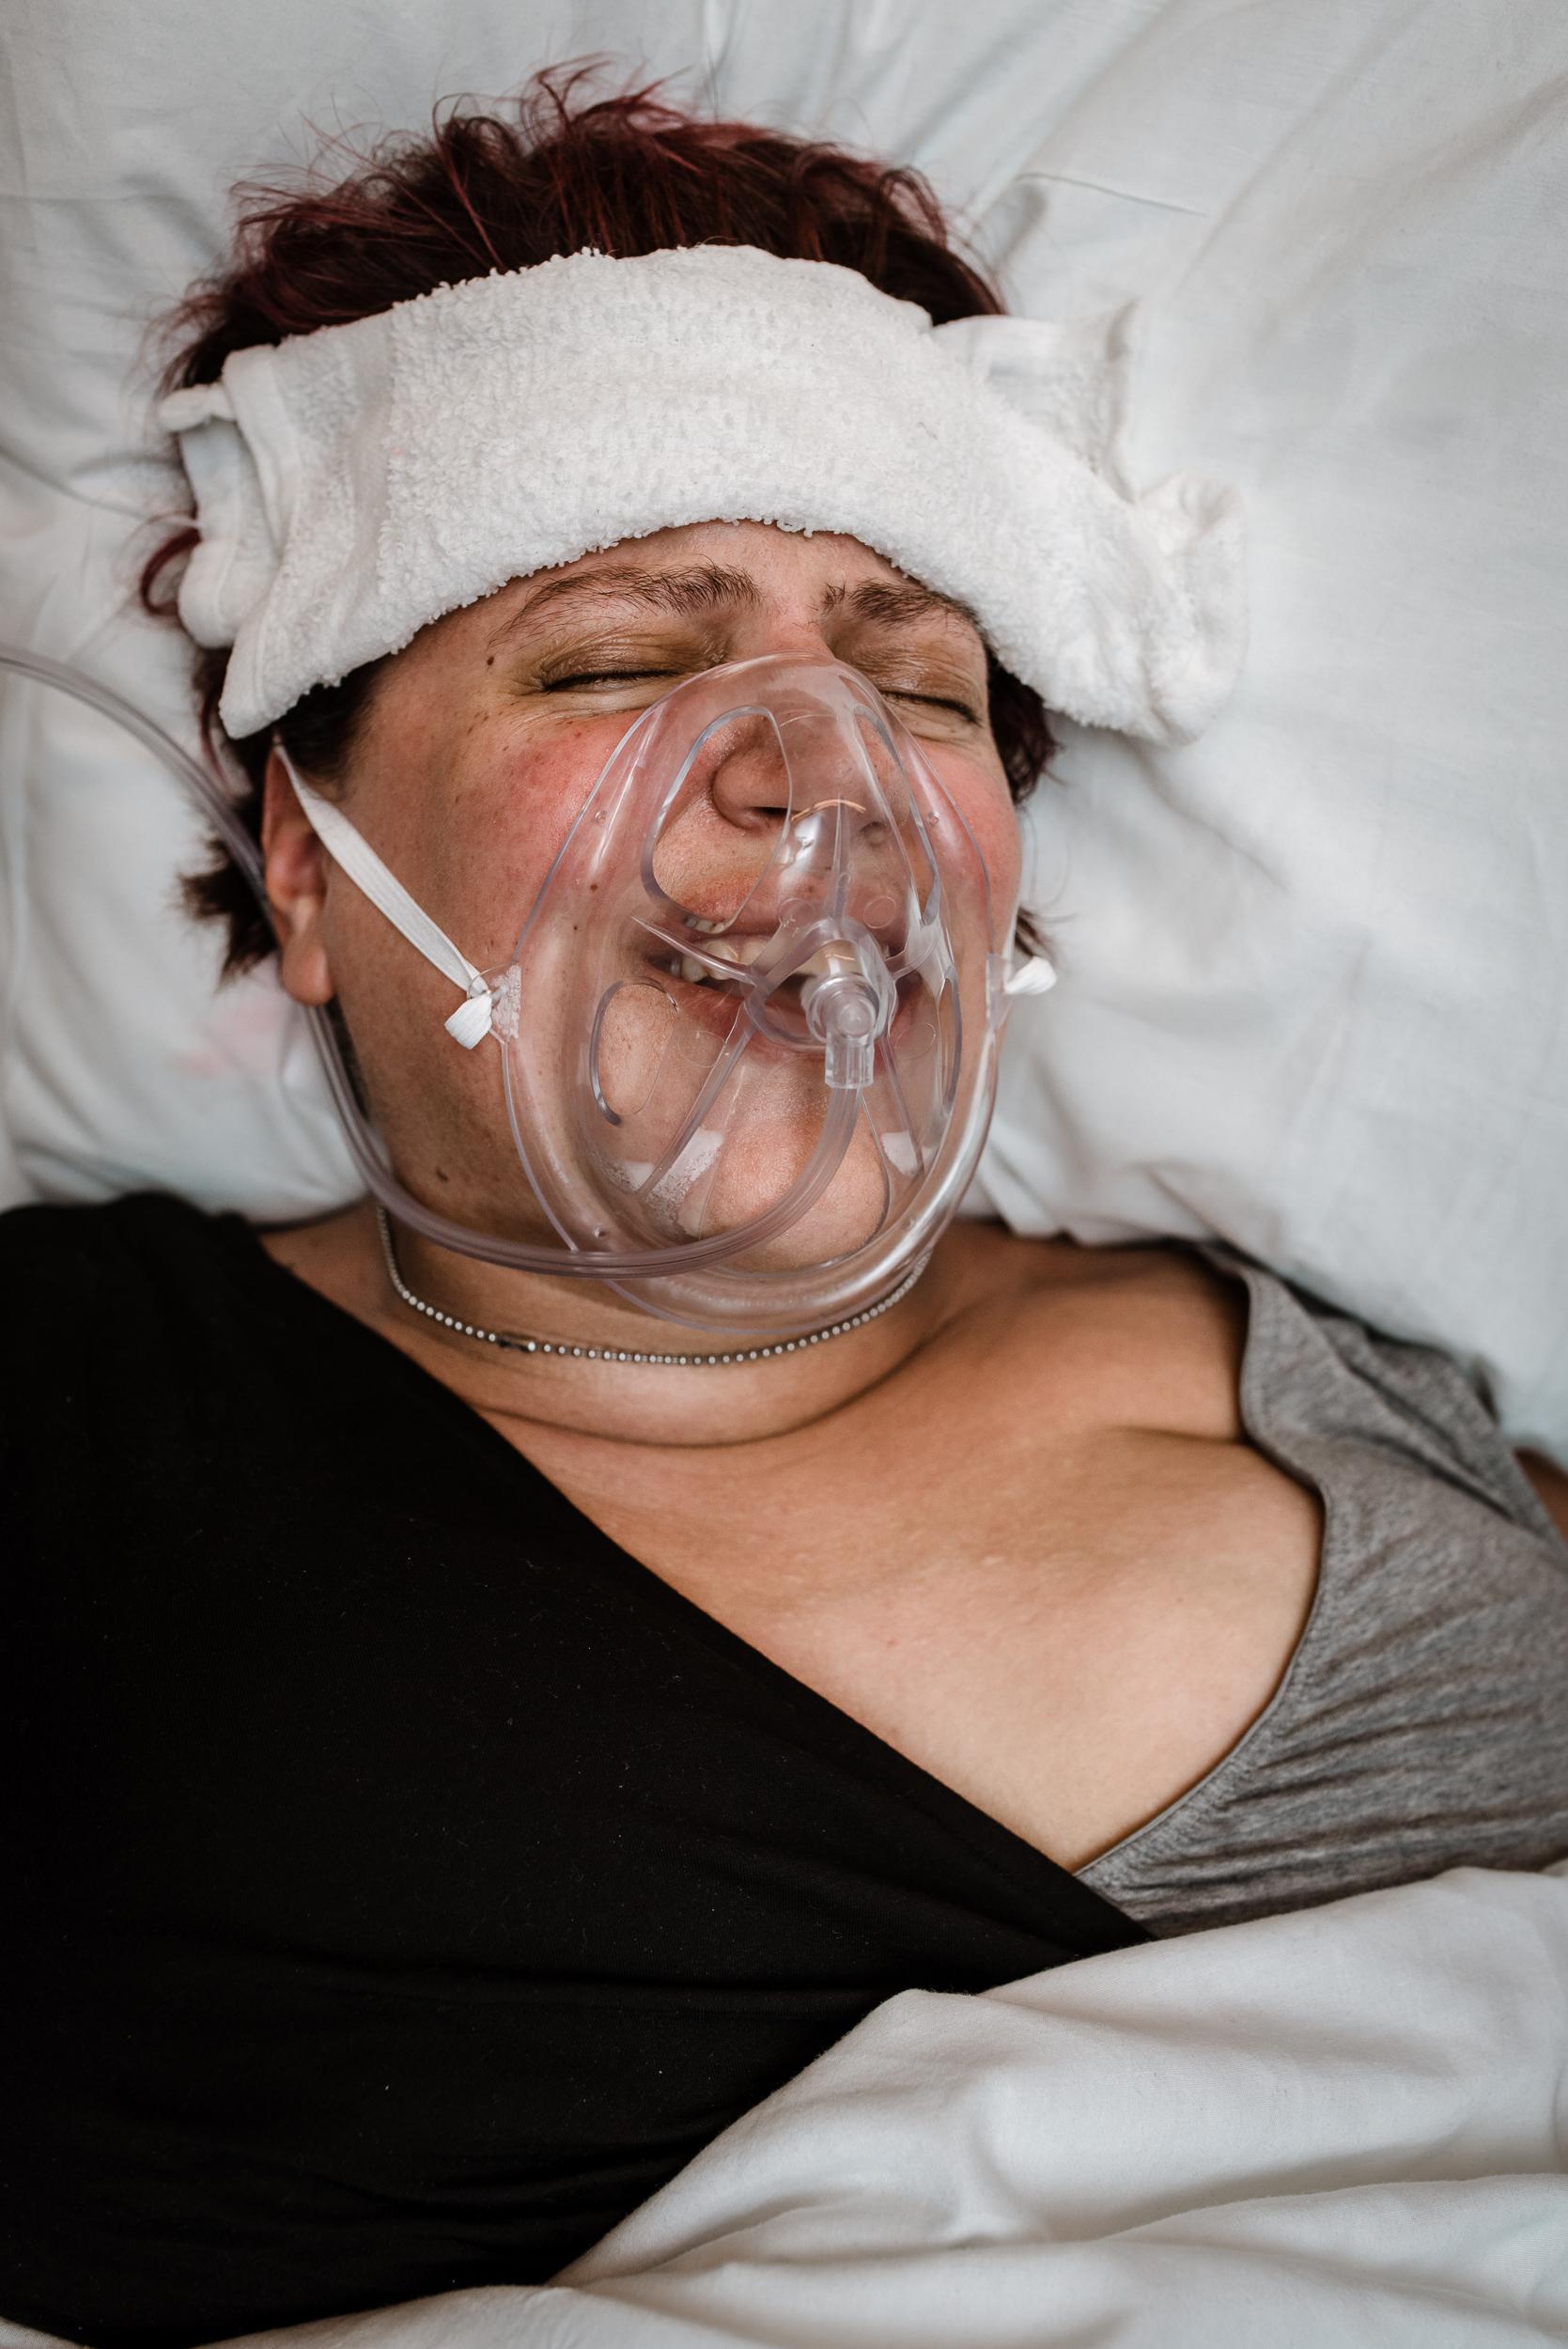 Meredith Westin Photography- Minneapolis Birth Stories and Films-November 08, 2018-154313.jpg